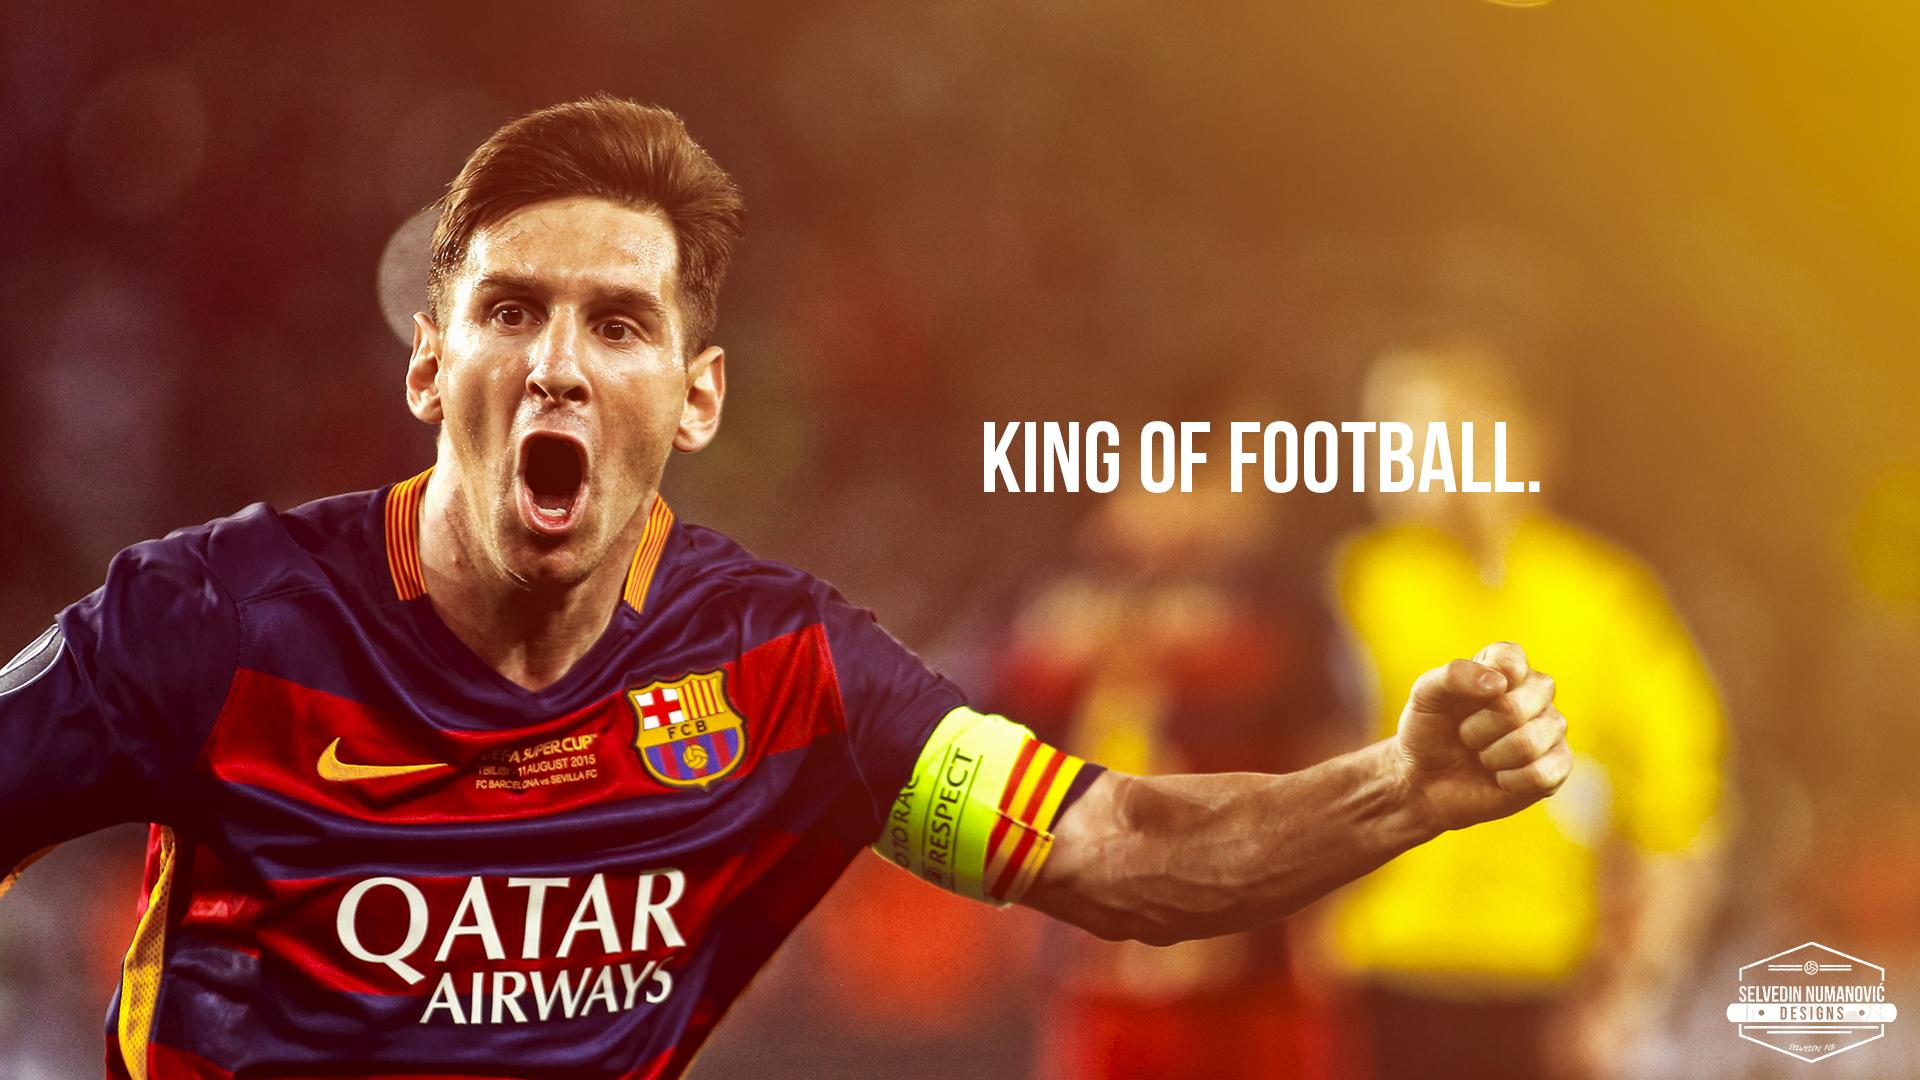 Lionel Messi WALLPAPER 2015 by SelvedinFCB Lionel Messi WALLPAPER 2015 1920x1080